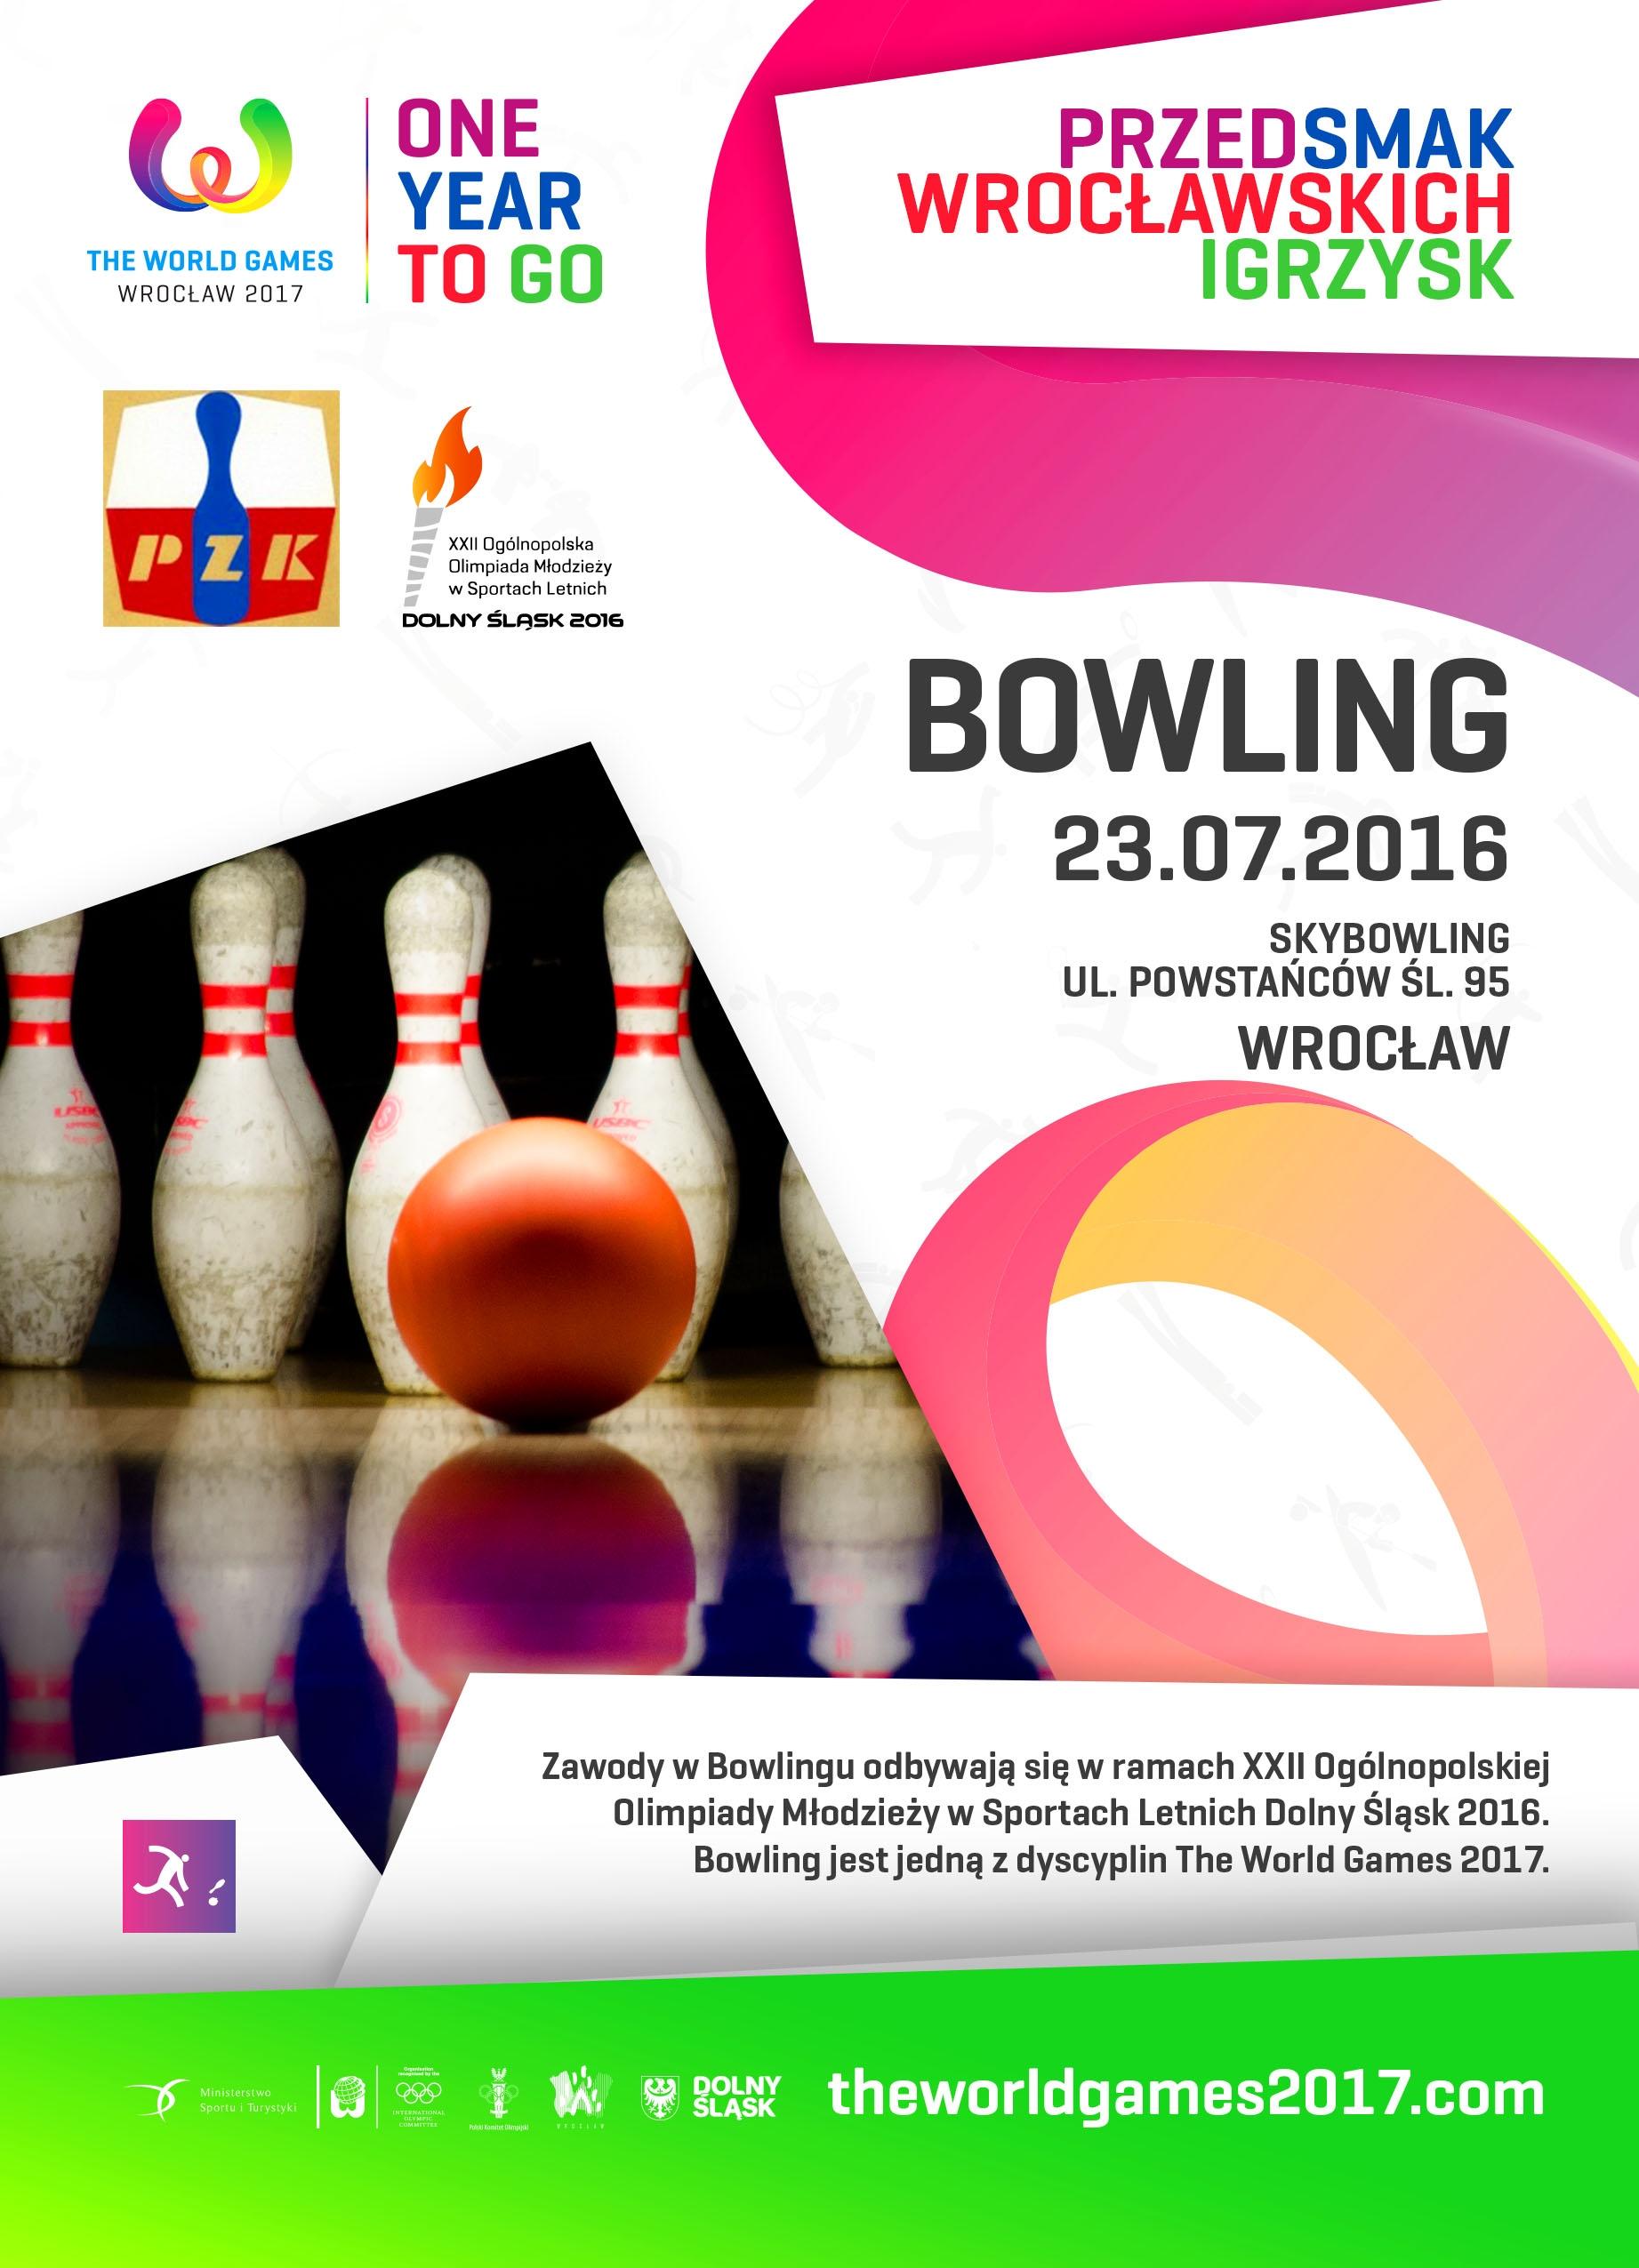 TWG_koncept_OYTG_A5_bowling